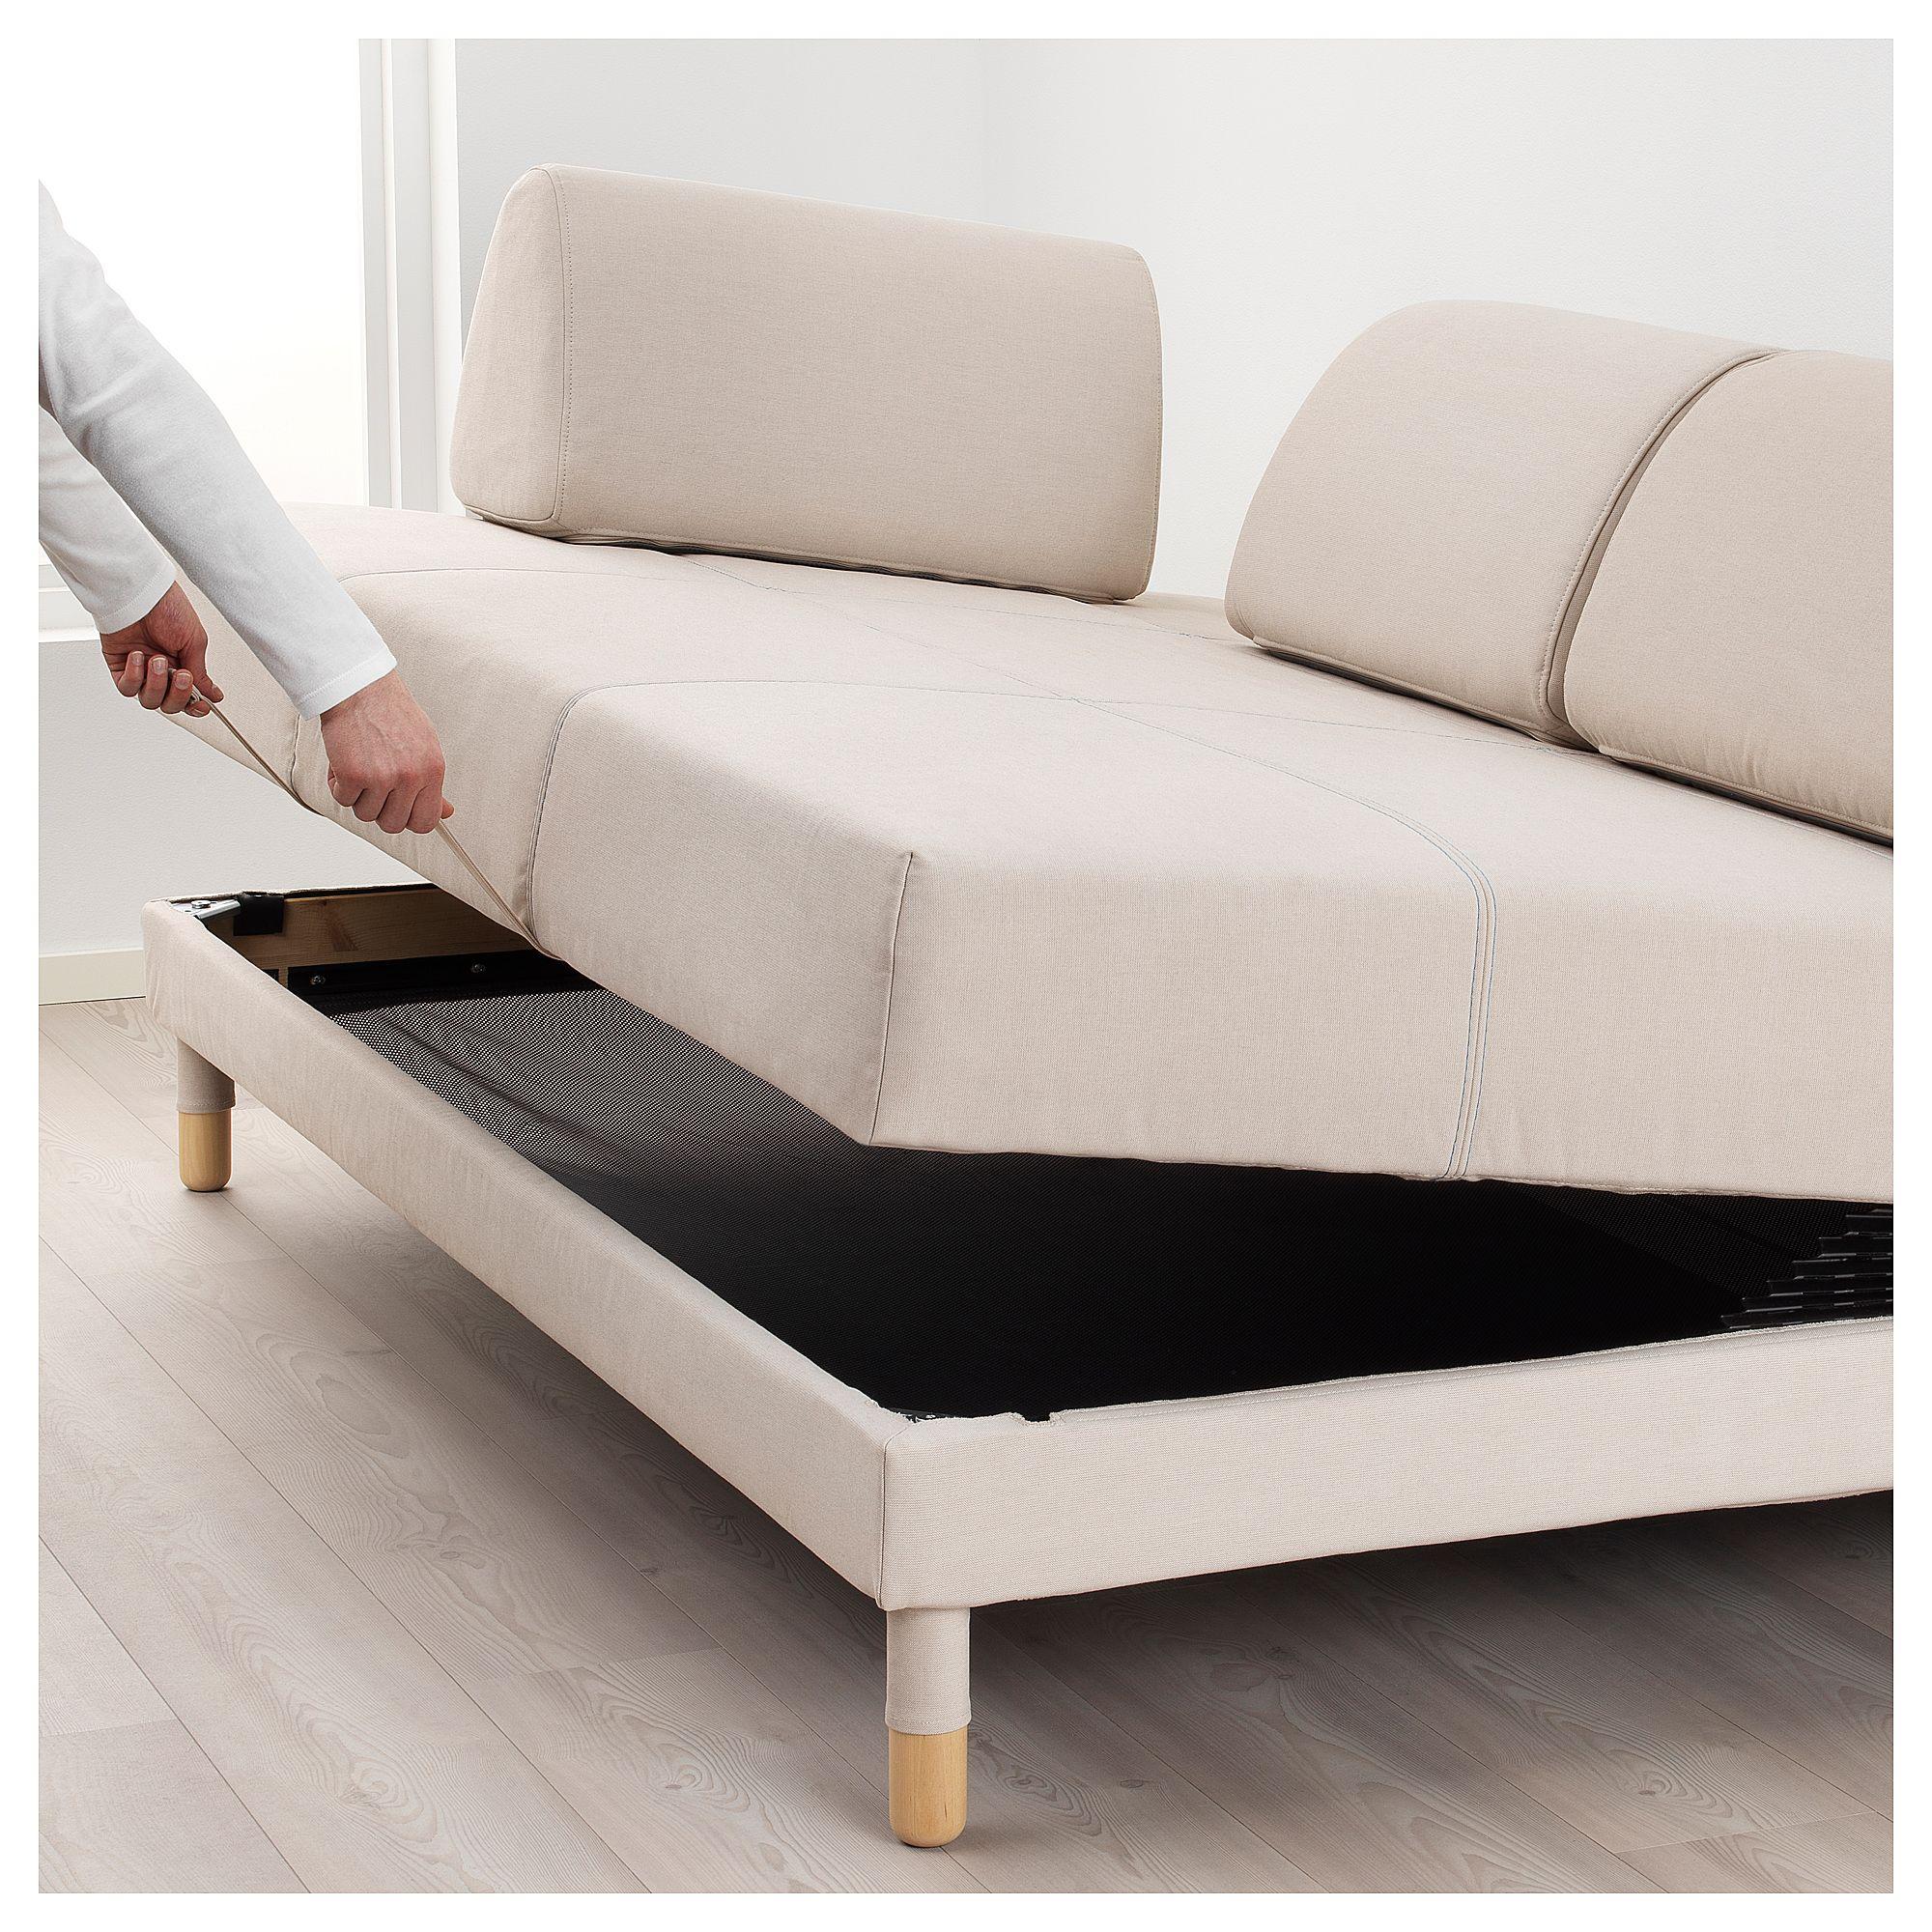 sofa bed support mat canada urban ikea flottebo sleeper with side table lofallet